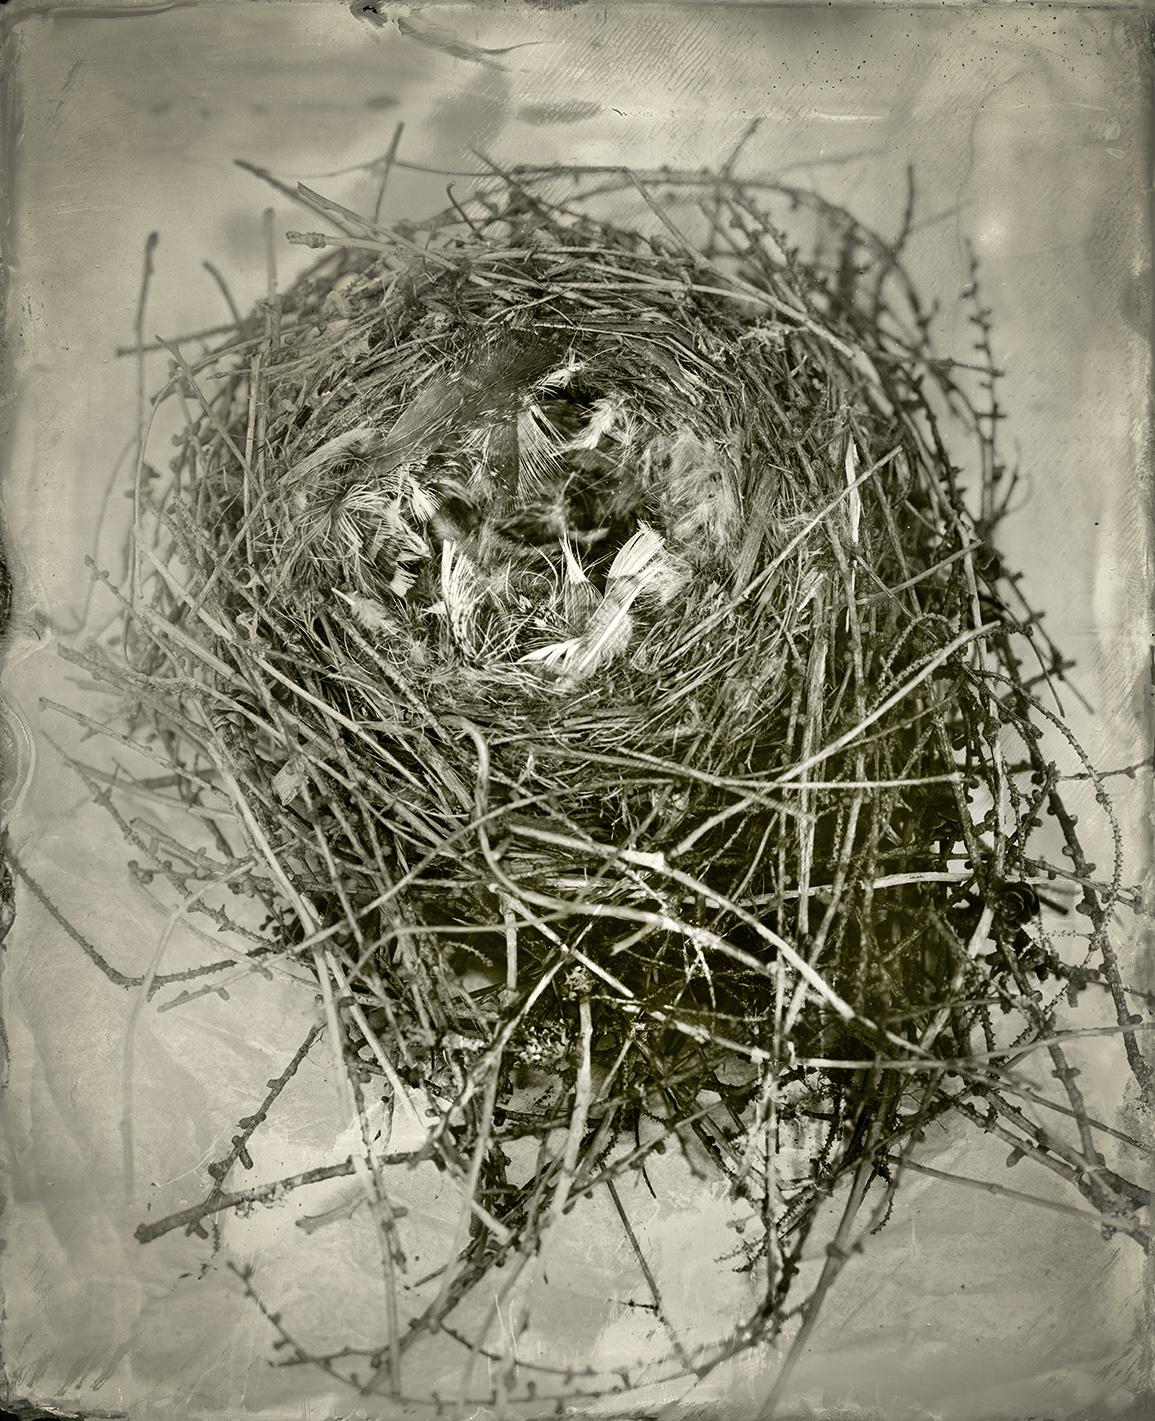 Perisoreus canadensis Nest